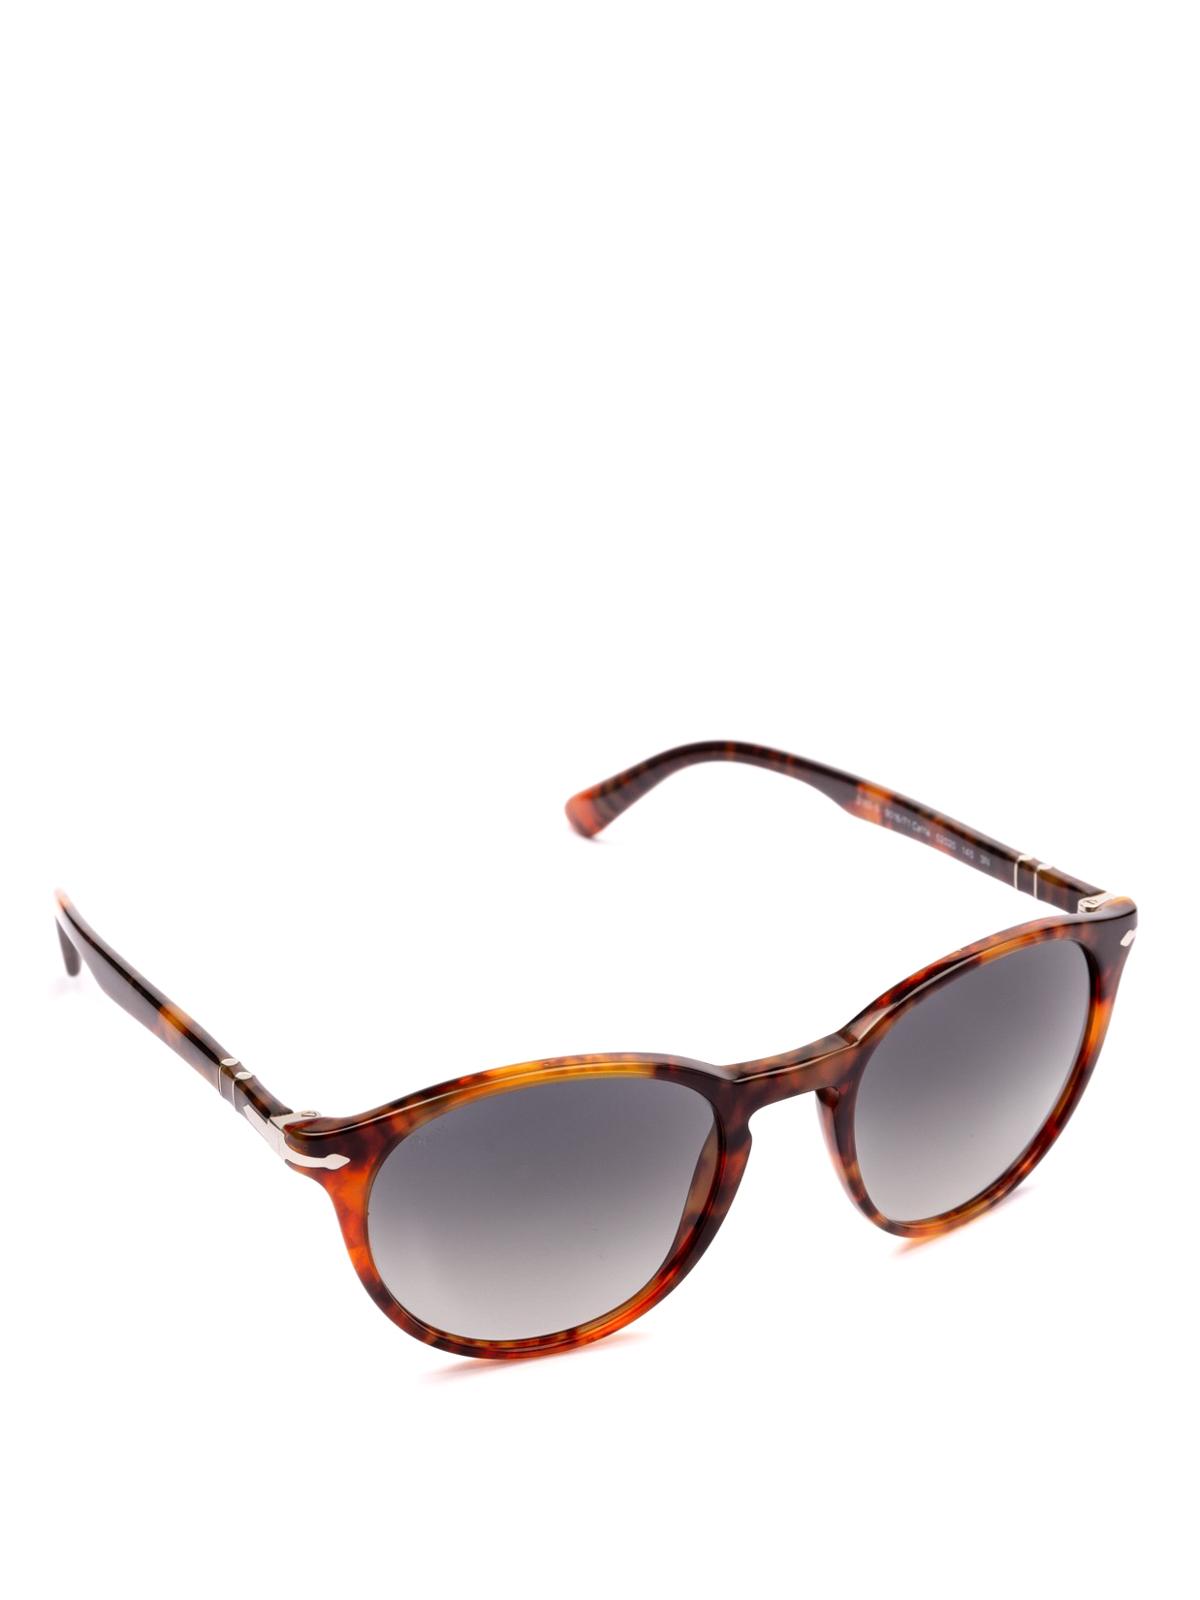 12499a9a68 Persol - Tortoise frame oval dark lens sunglasses - sunglasses ...